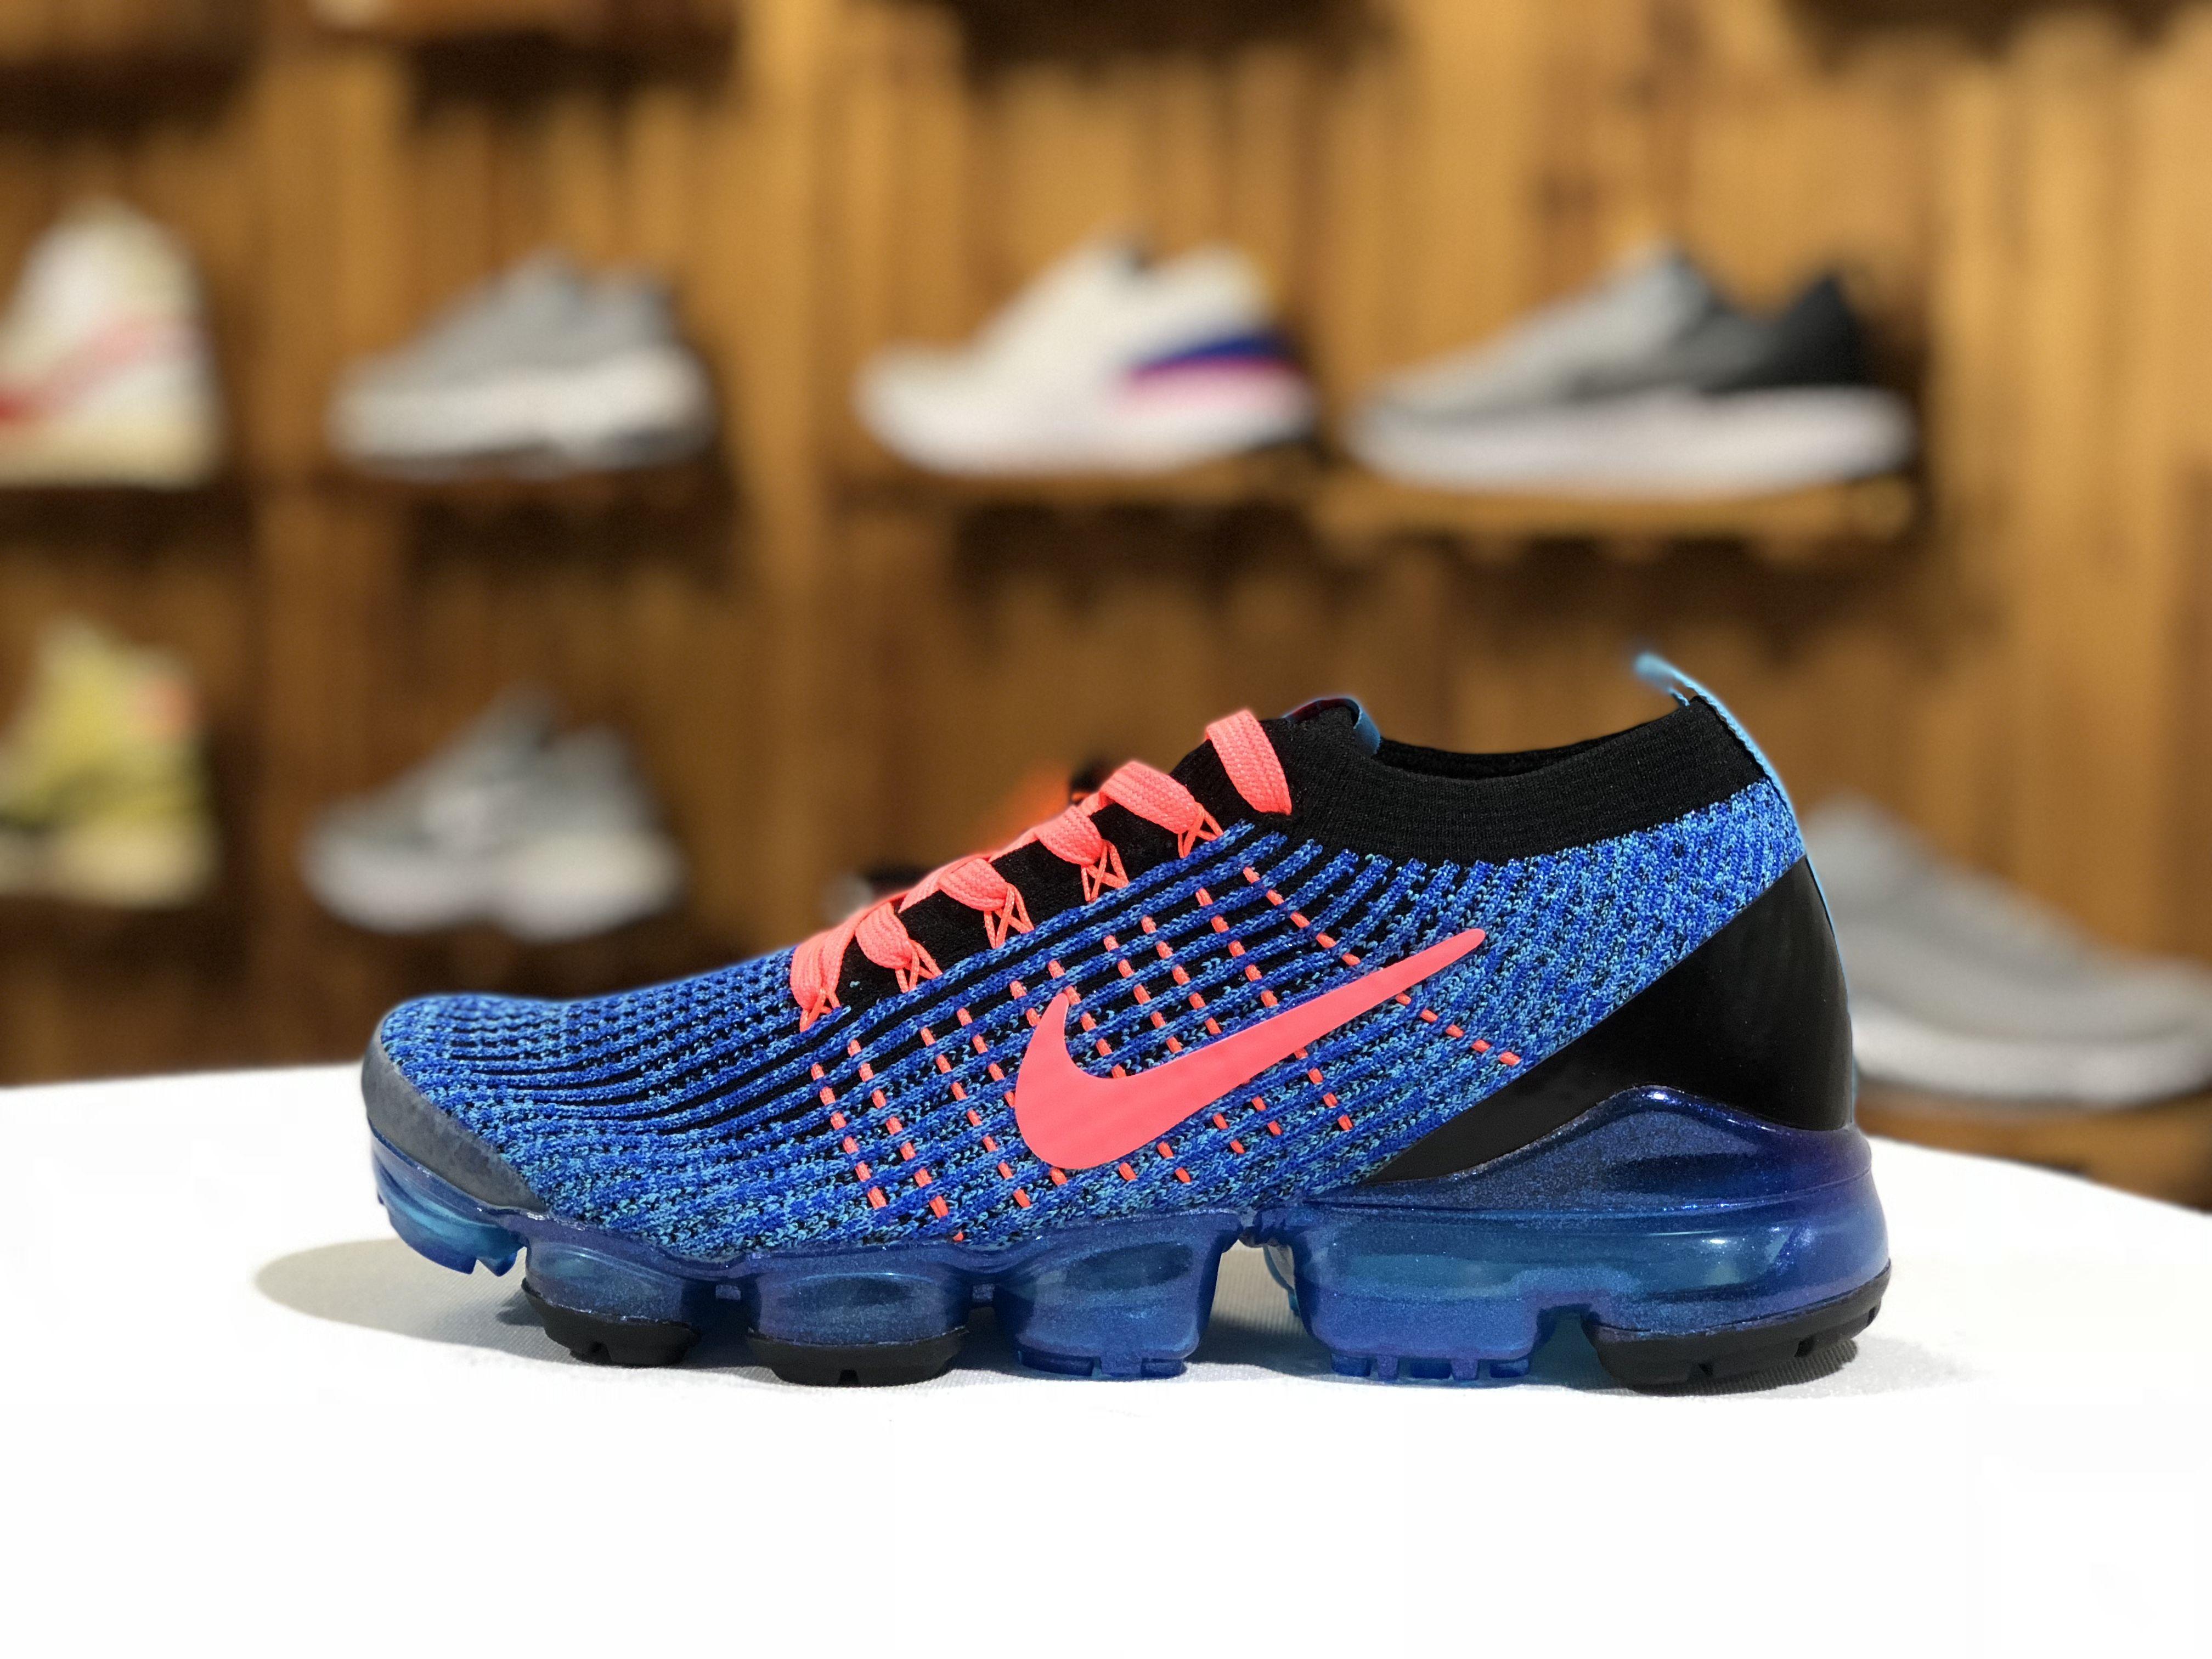 698fcd932540e Nike Air Vapormax Flyknit 2019 3.0 Black Royal Blue Pink Running Shoes